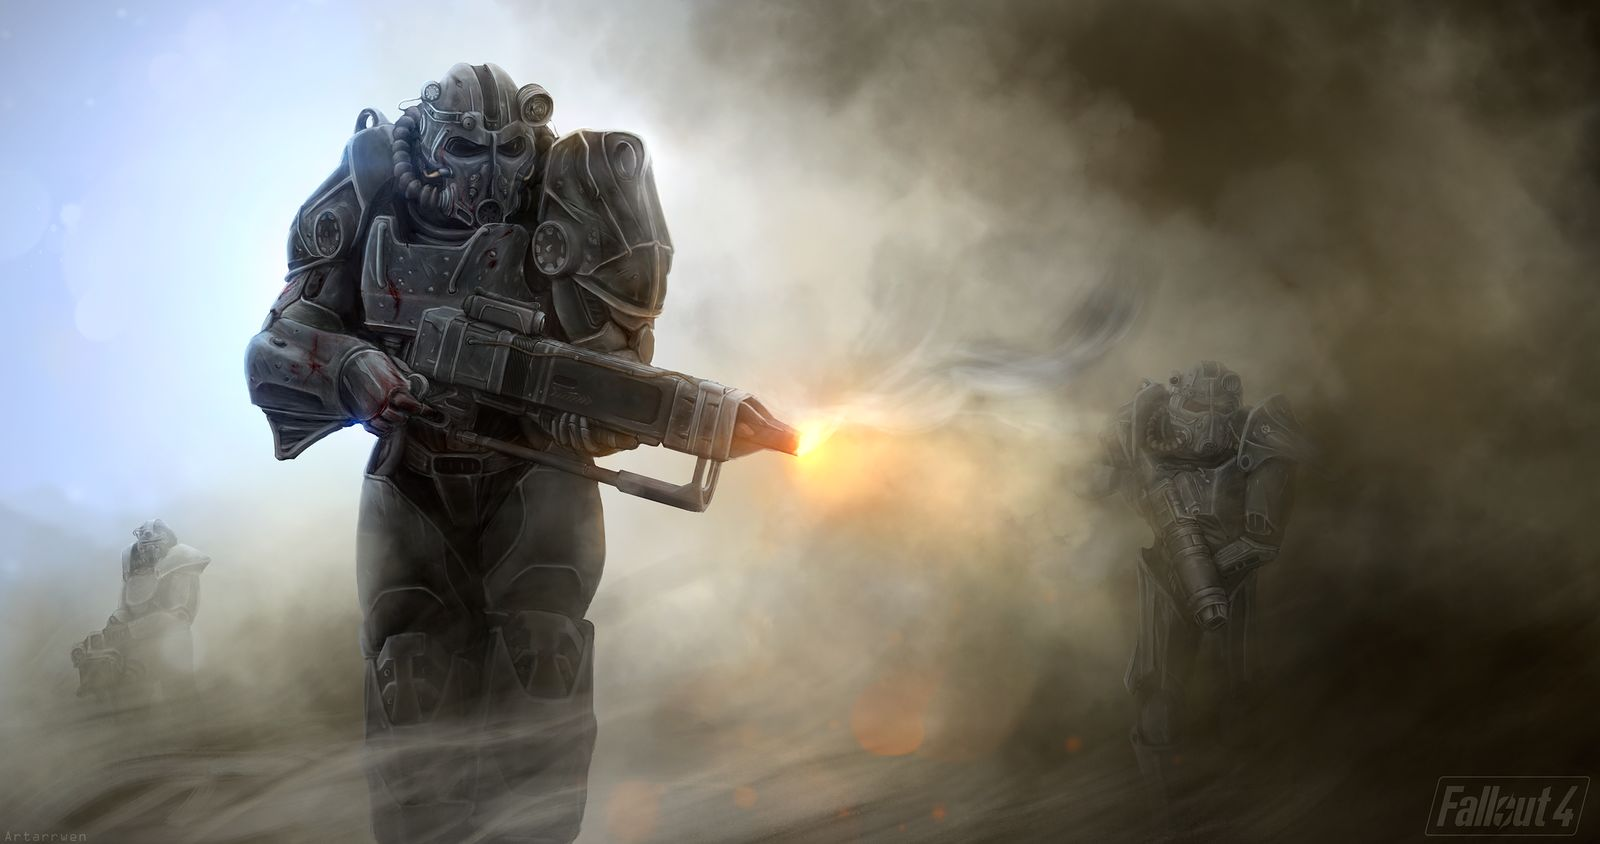 Fallout 4 art силовая броня